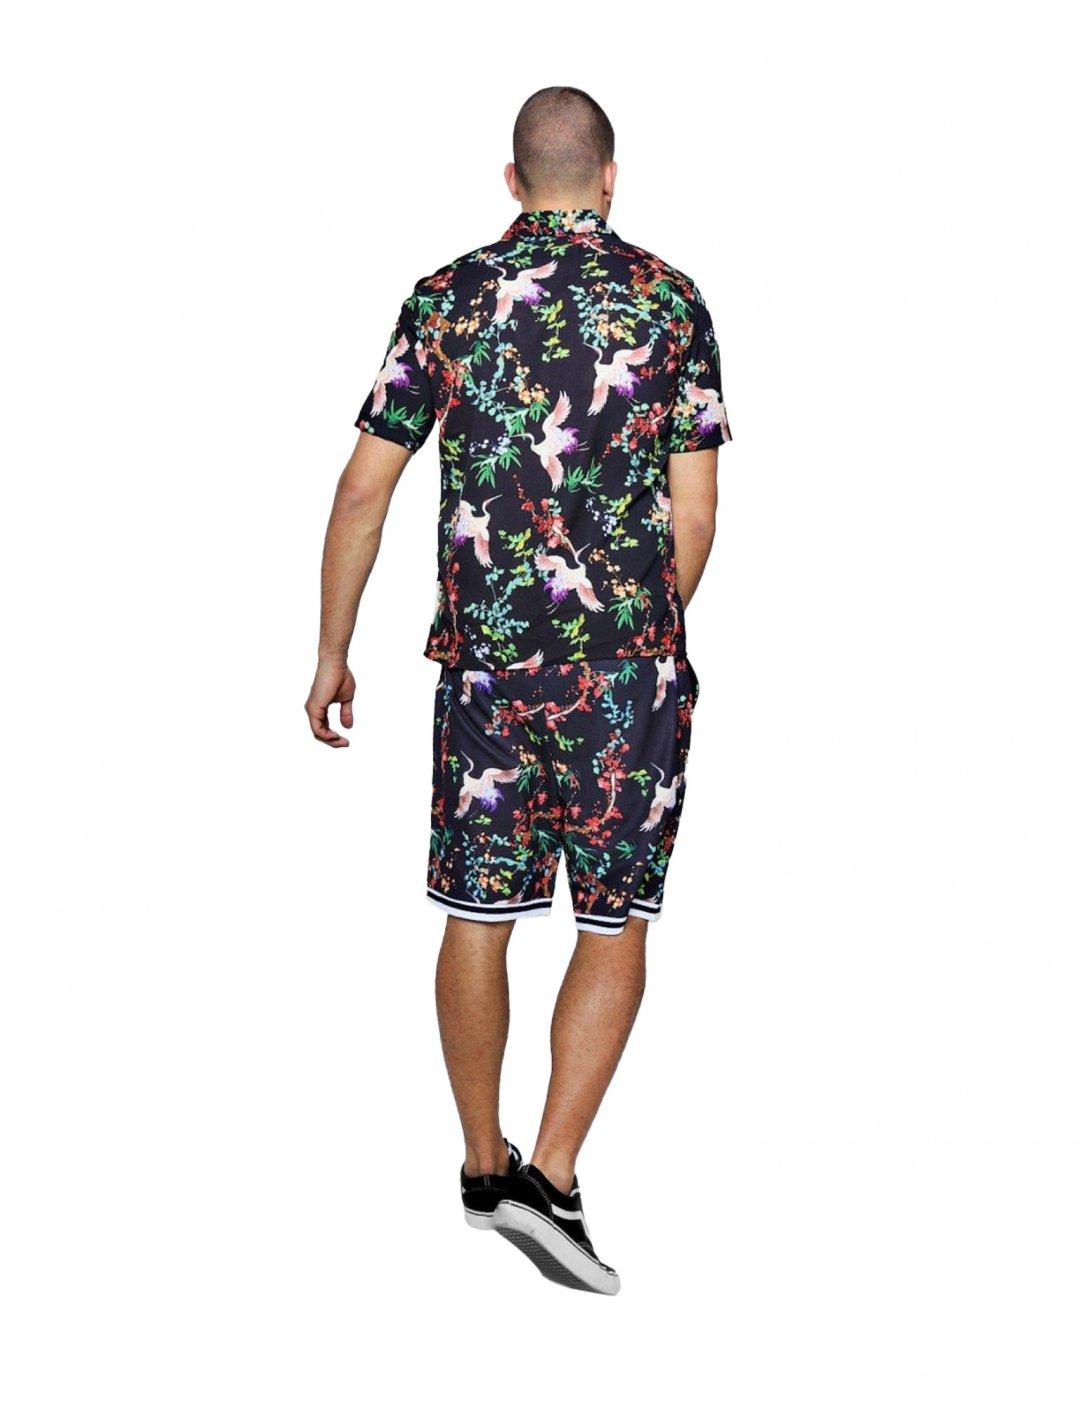 "BoohooMAN Bird Print Shirt {""id"":5,""product_section_id"":1,""name"":""Clothing"",""order"":5} boohooMAN"